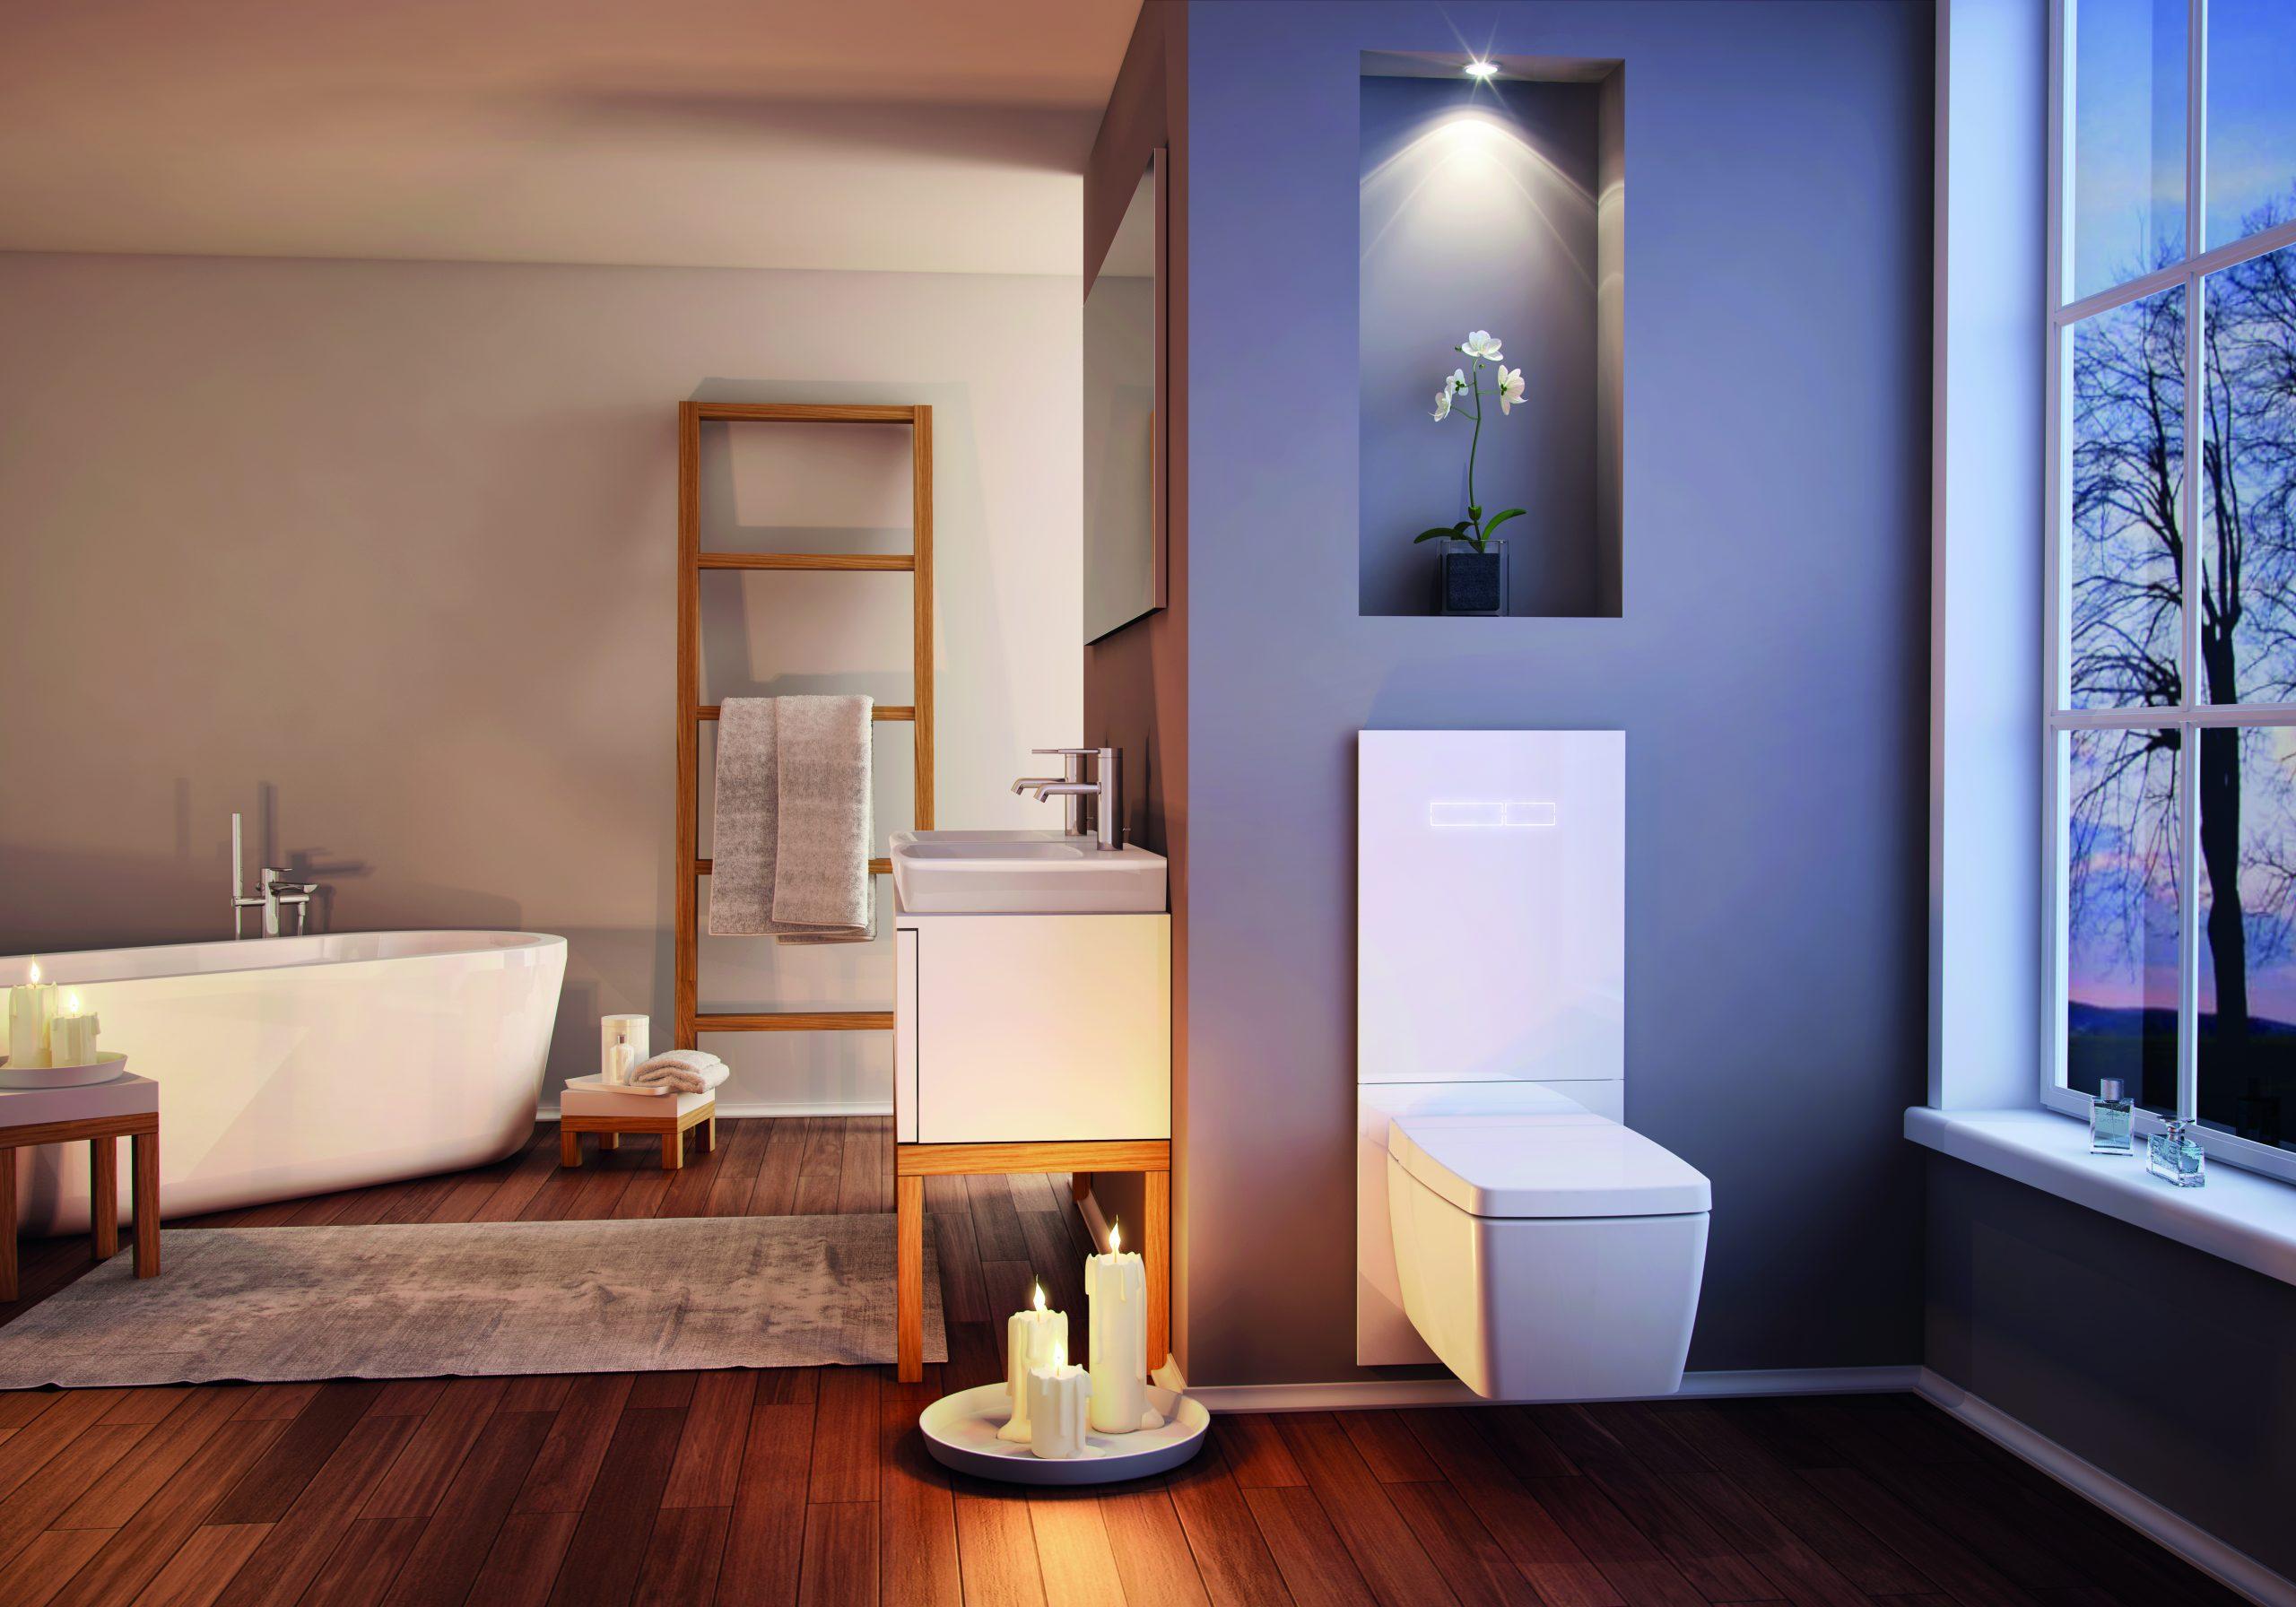 Mijn-bad-in-stijl-cool-blue-badkamer-tece